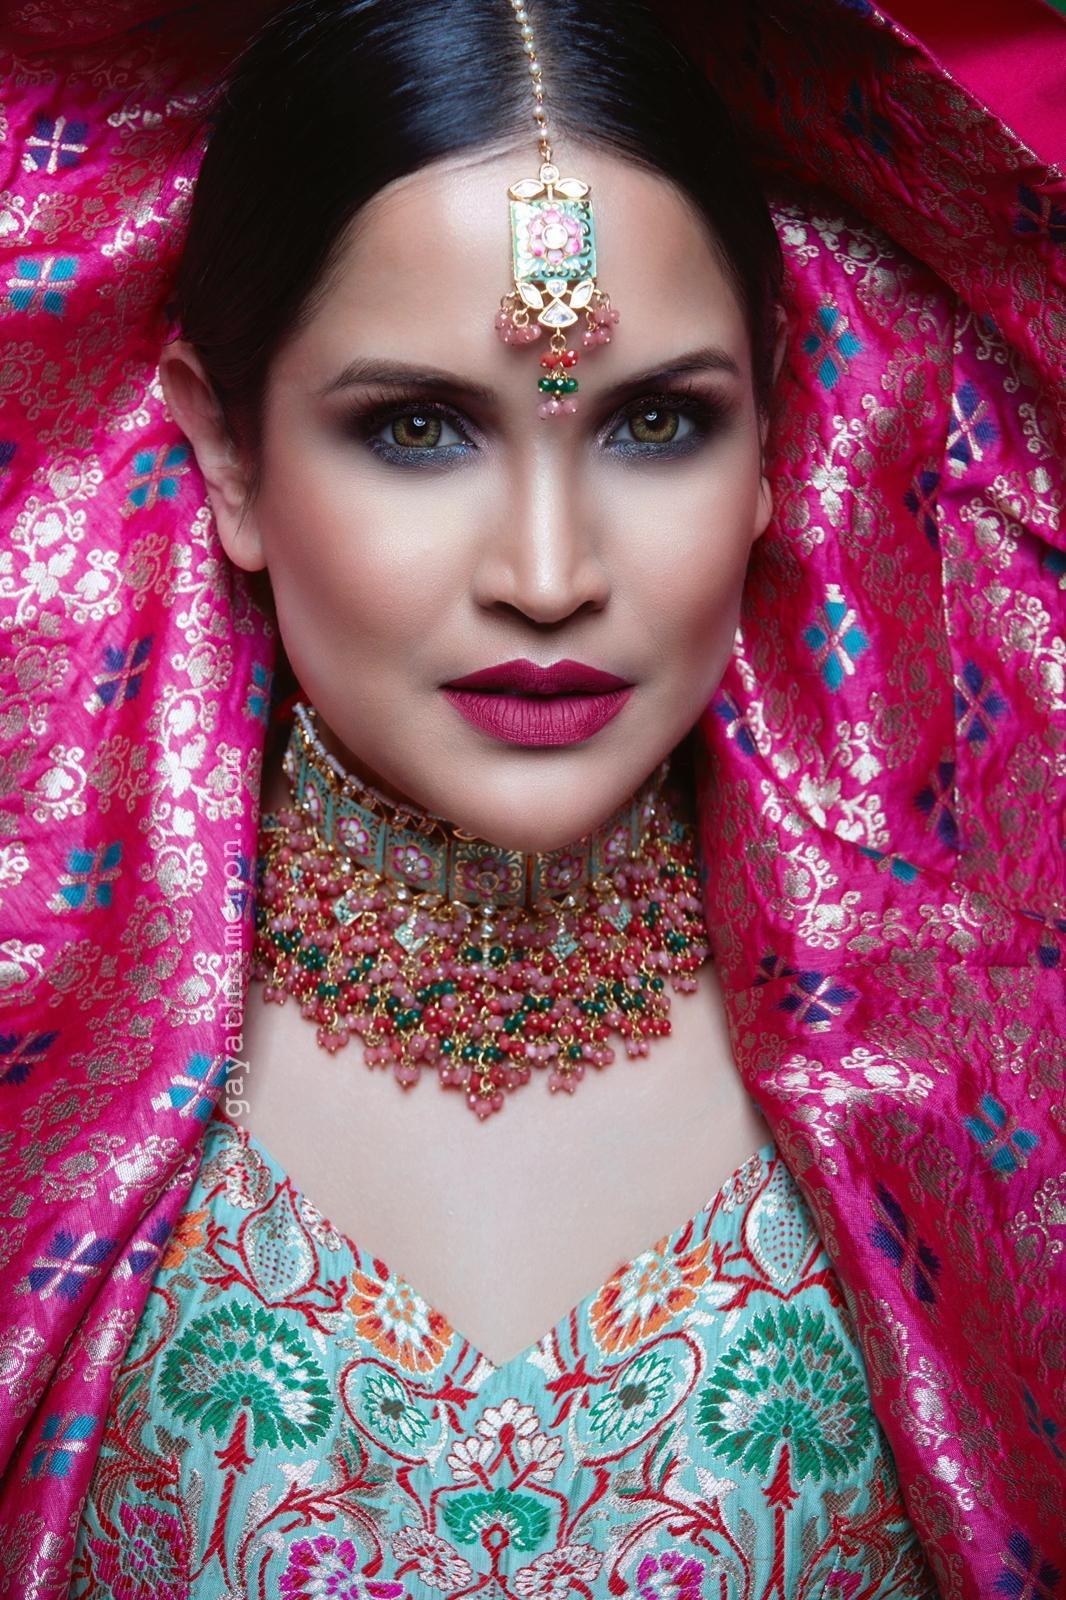 Amplio beauty Shoot for diwali